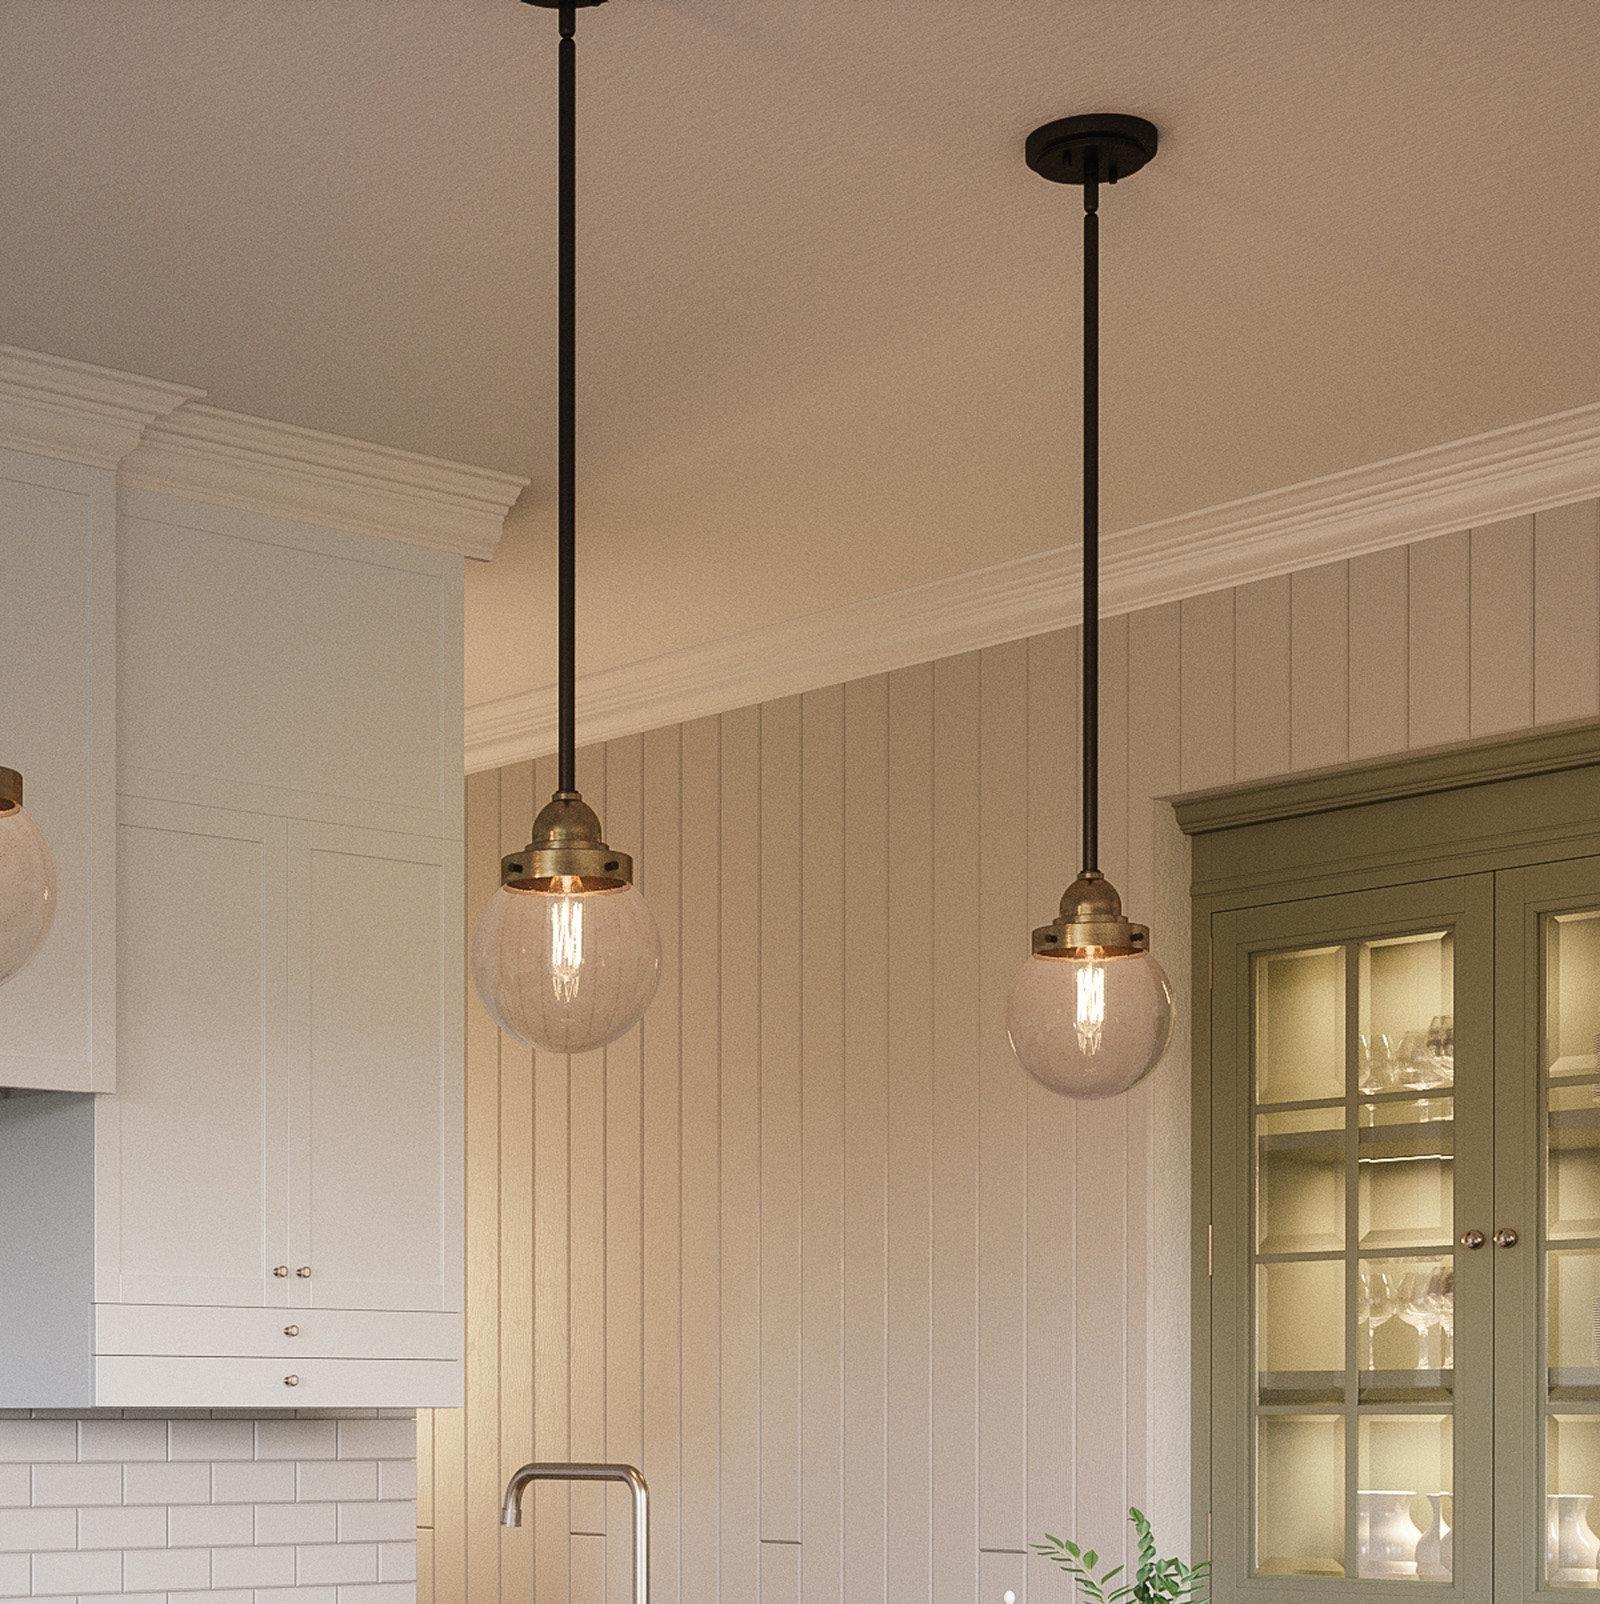 Brucie 1 Light Single Globe Pendant Throughout Fashionable 1 Light Globe Pendants (View 9 of 20)